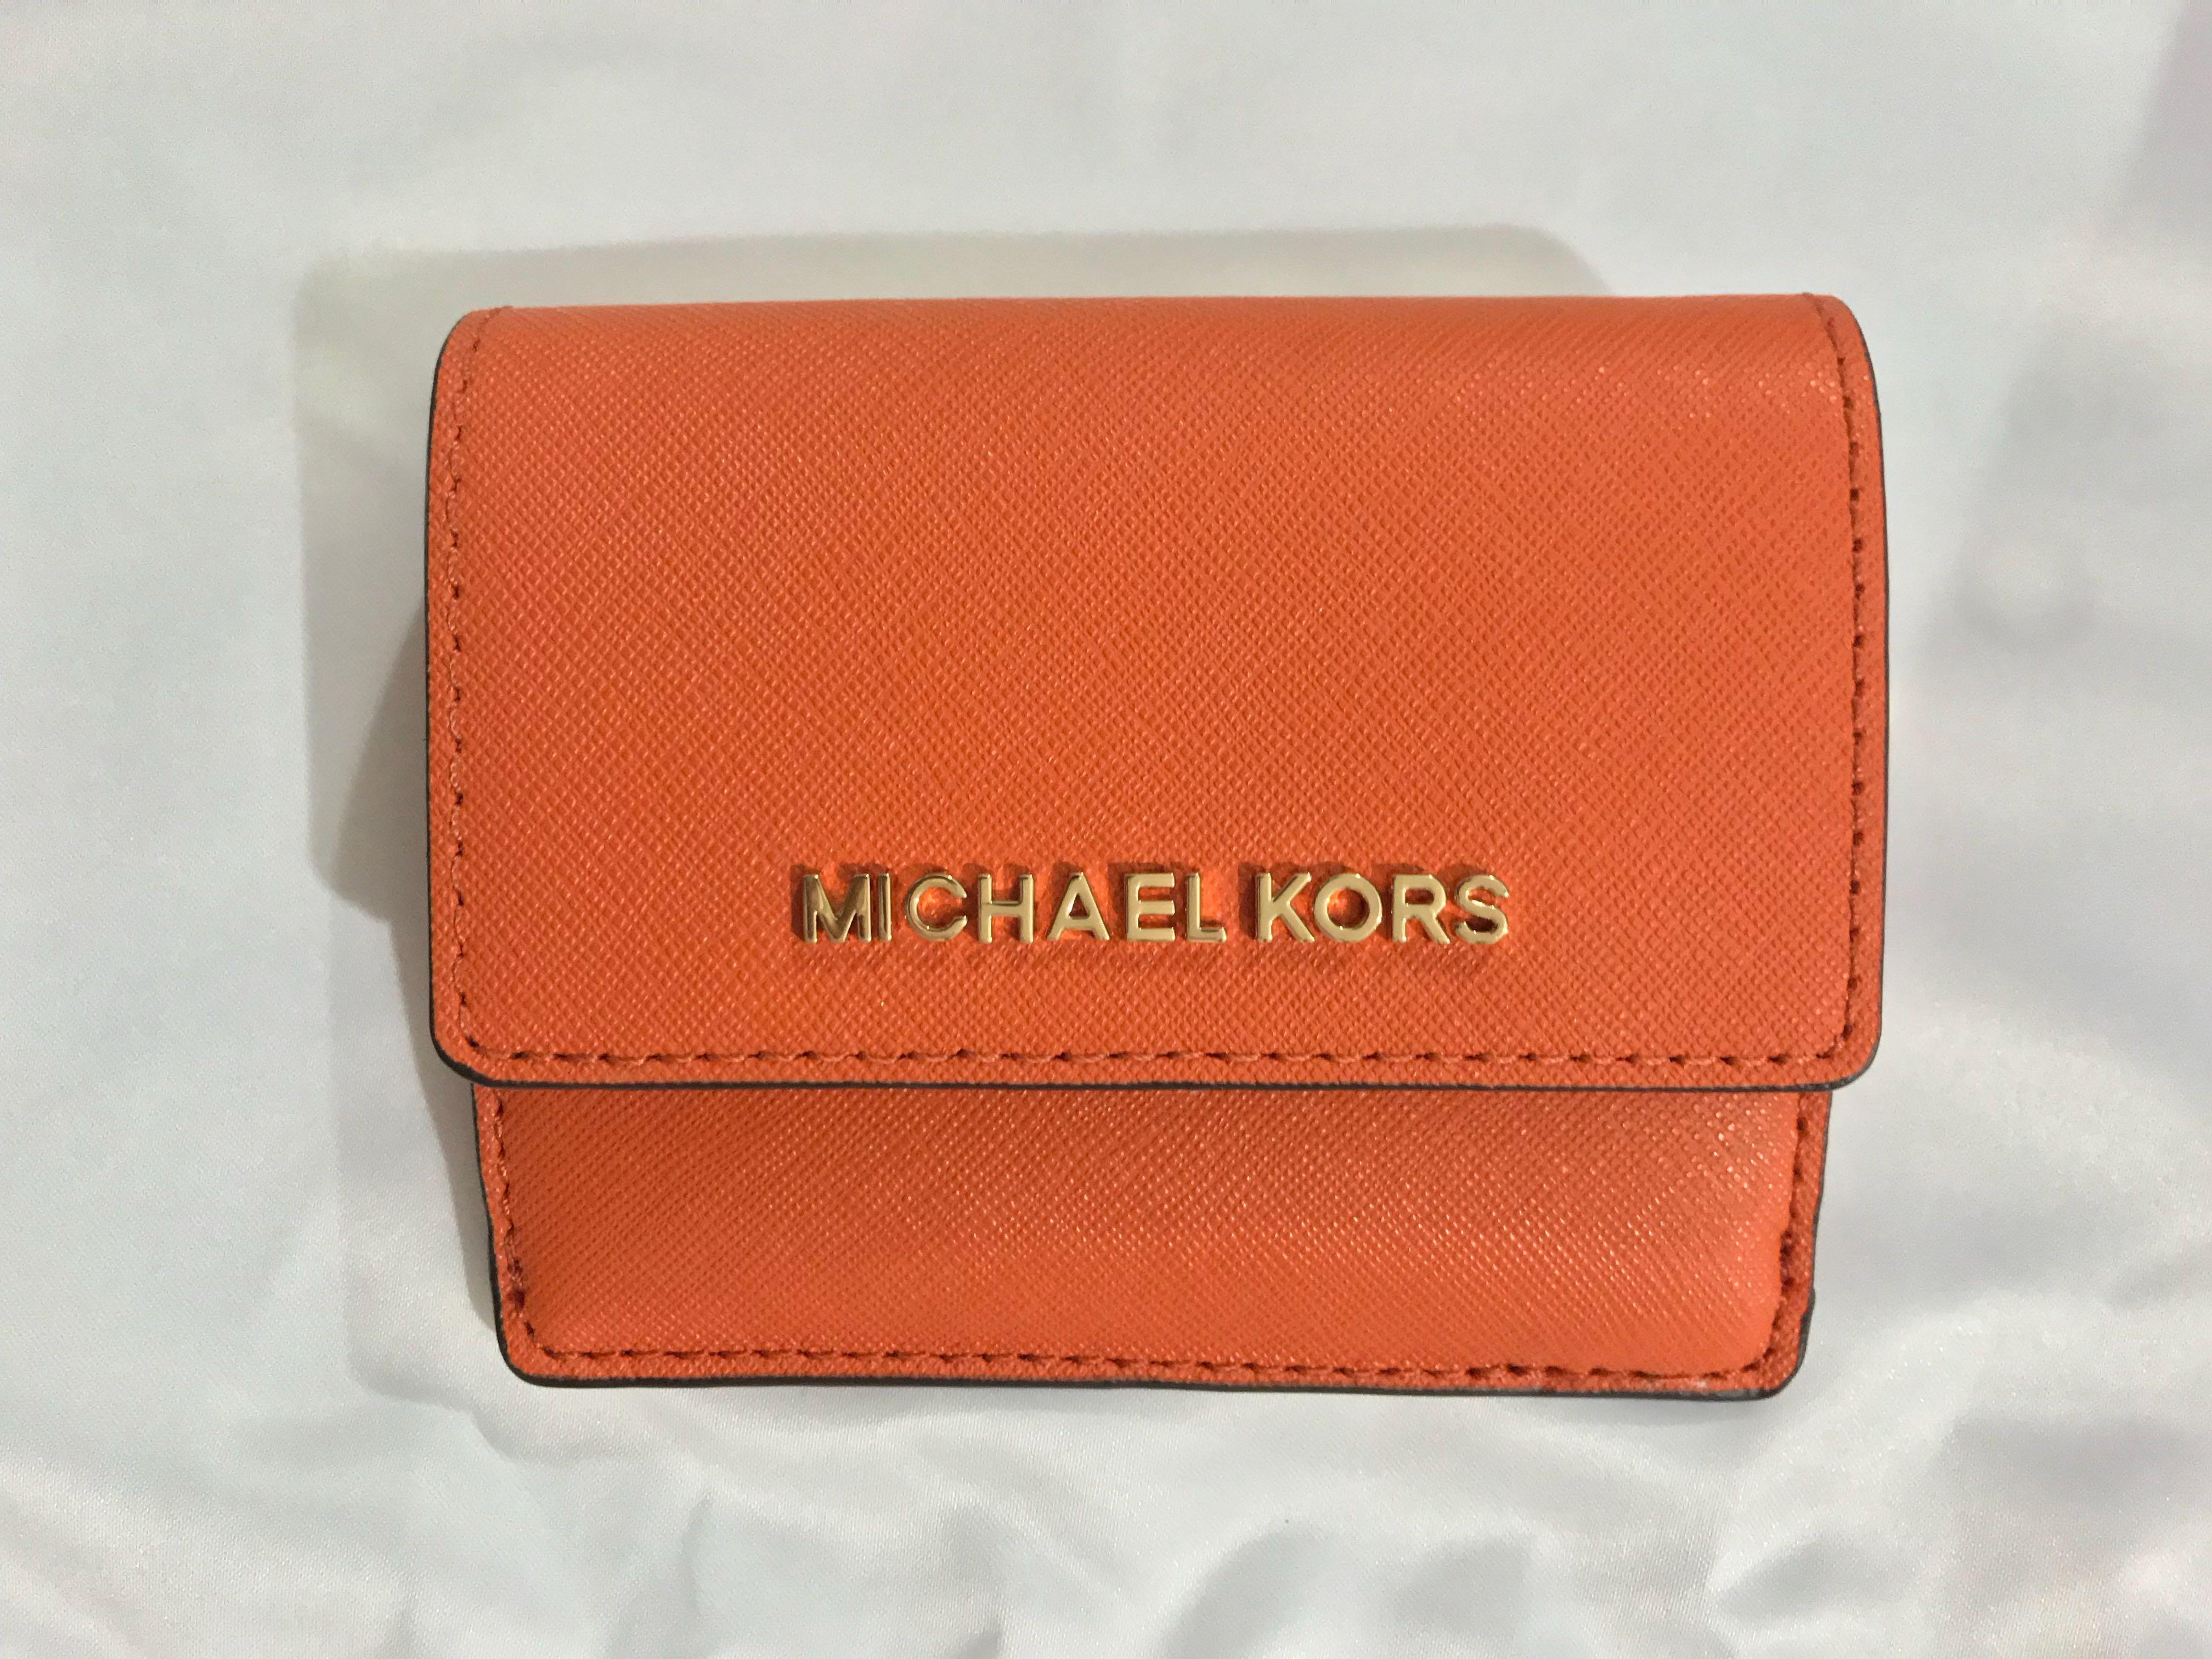 76064a1e07e5 BN Michael Kors Jet Set travel card case / key holder / key pouch in ...